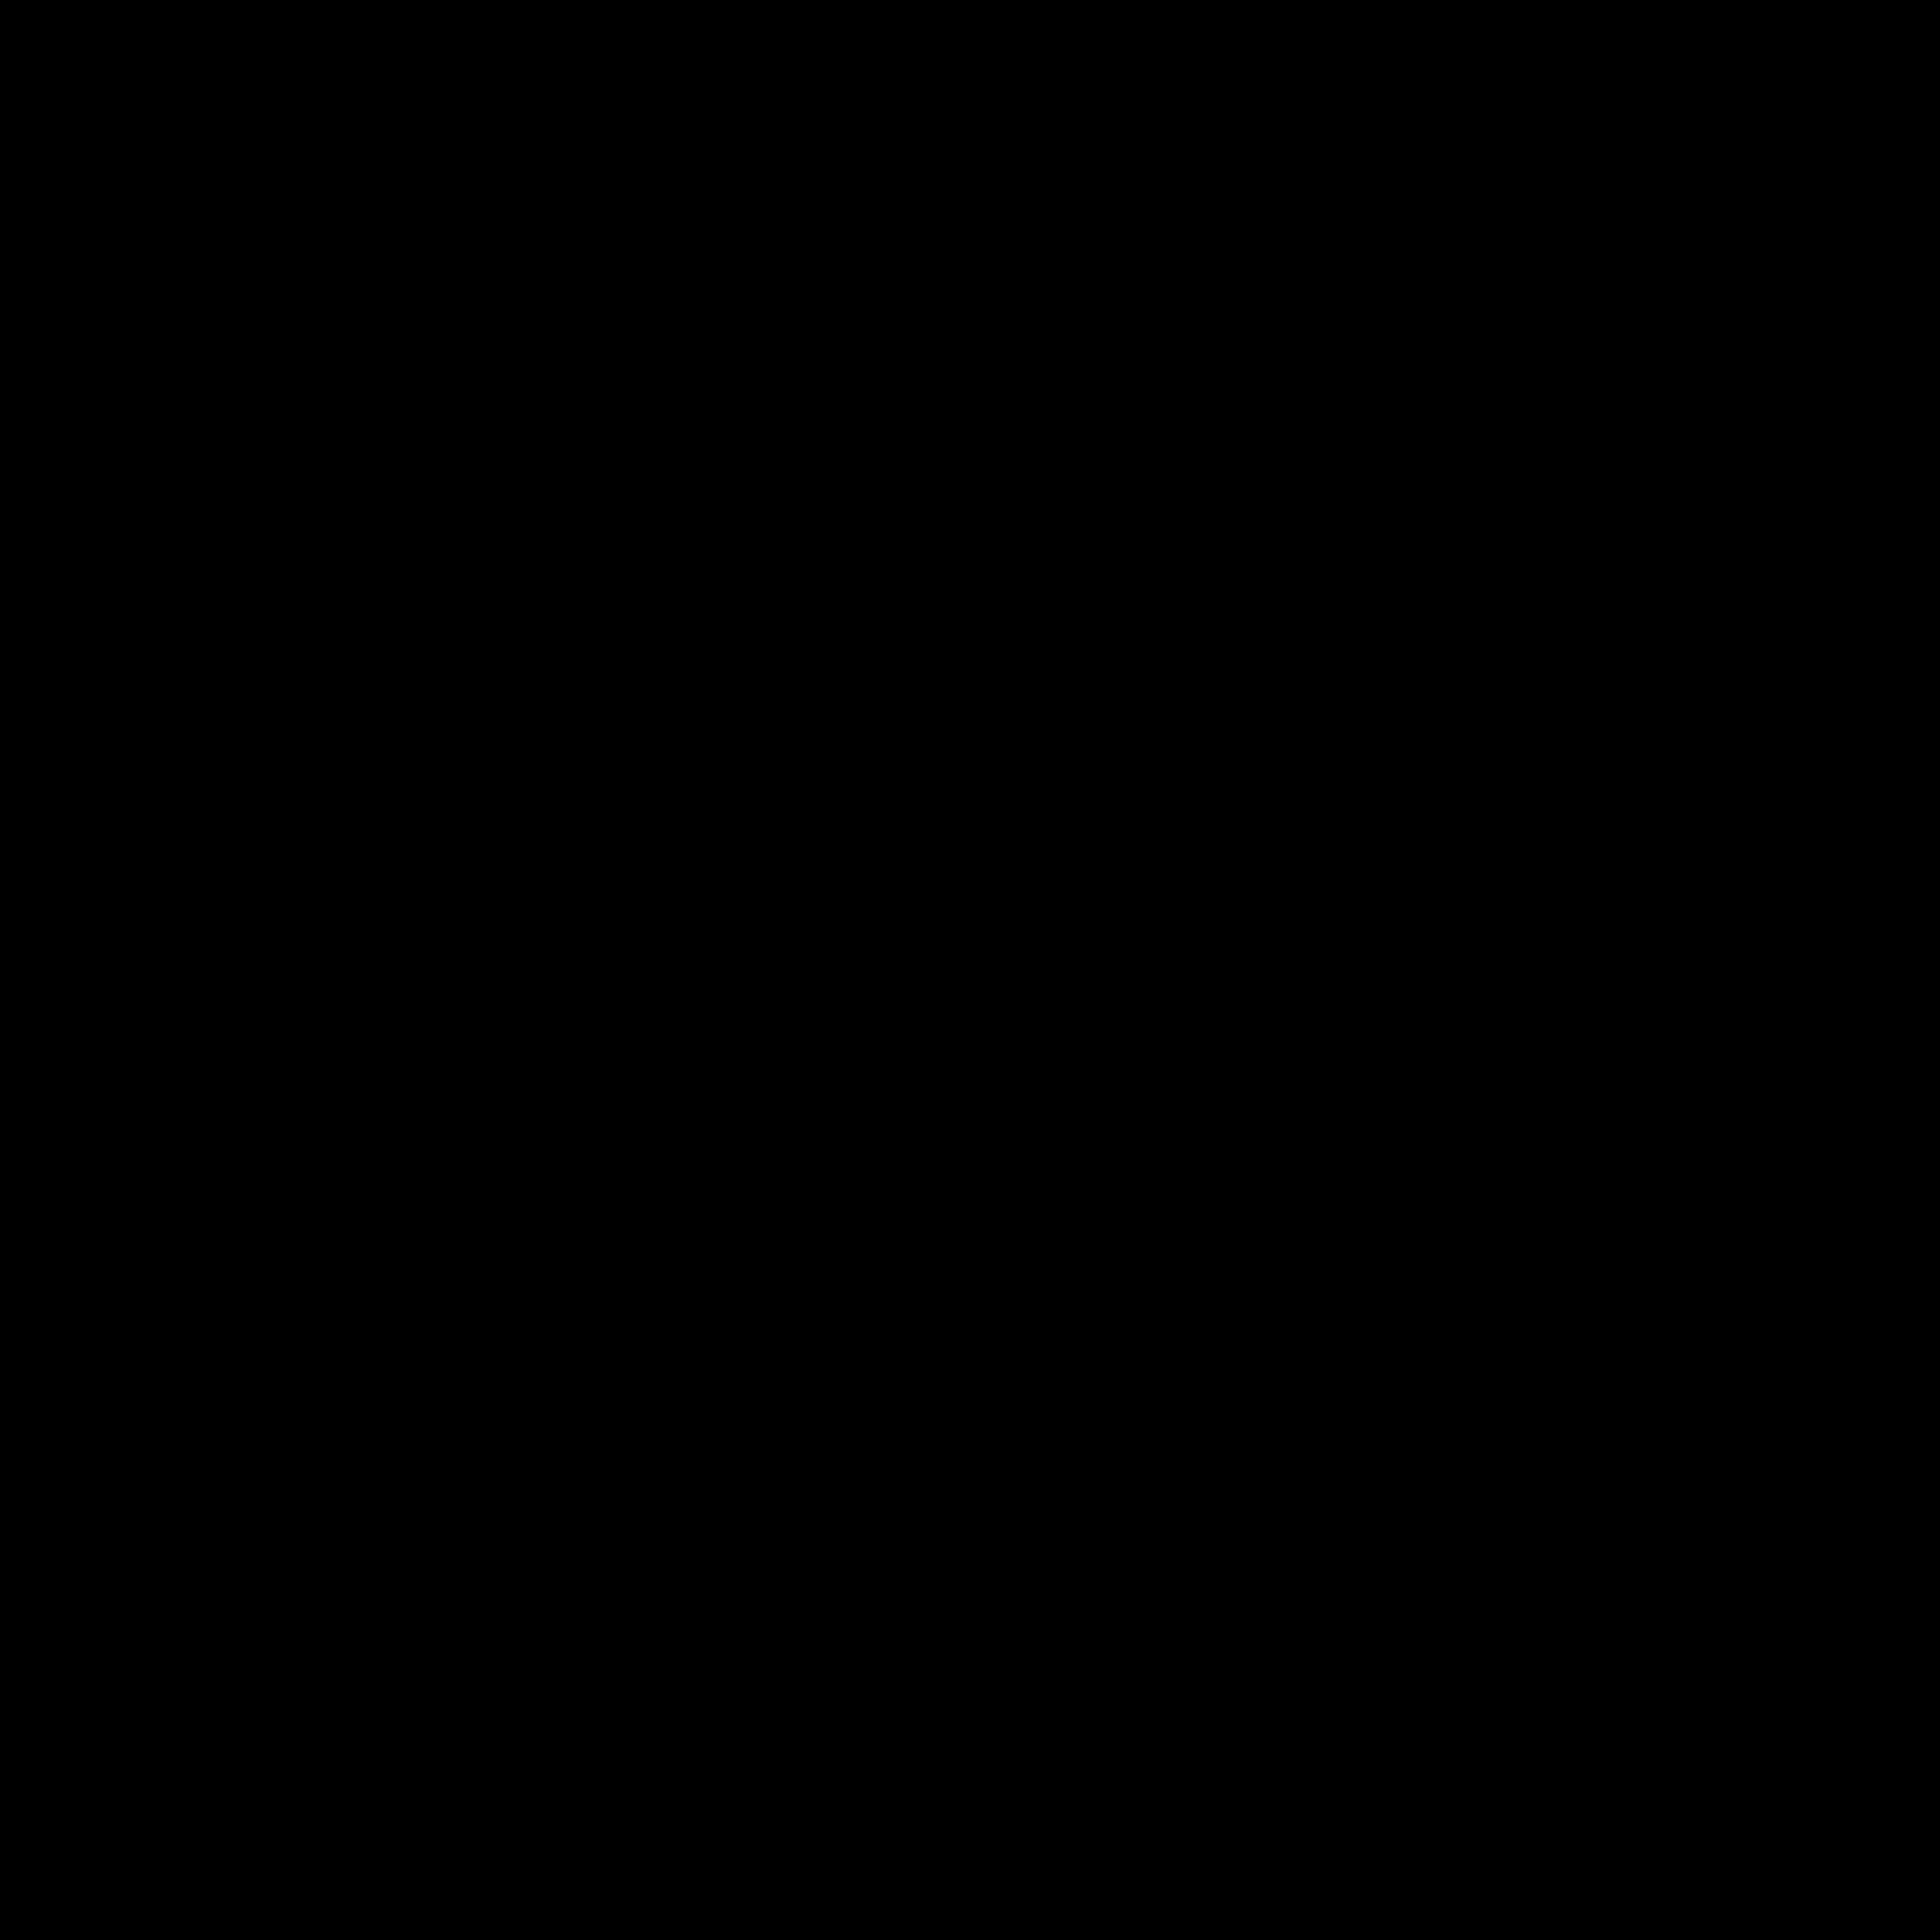 Yves Saint Laurent Logo PNG Transparent & SVG Vector.